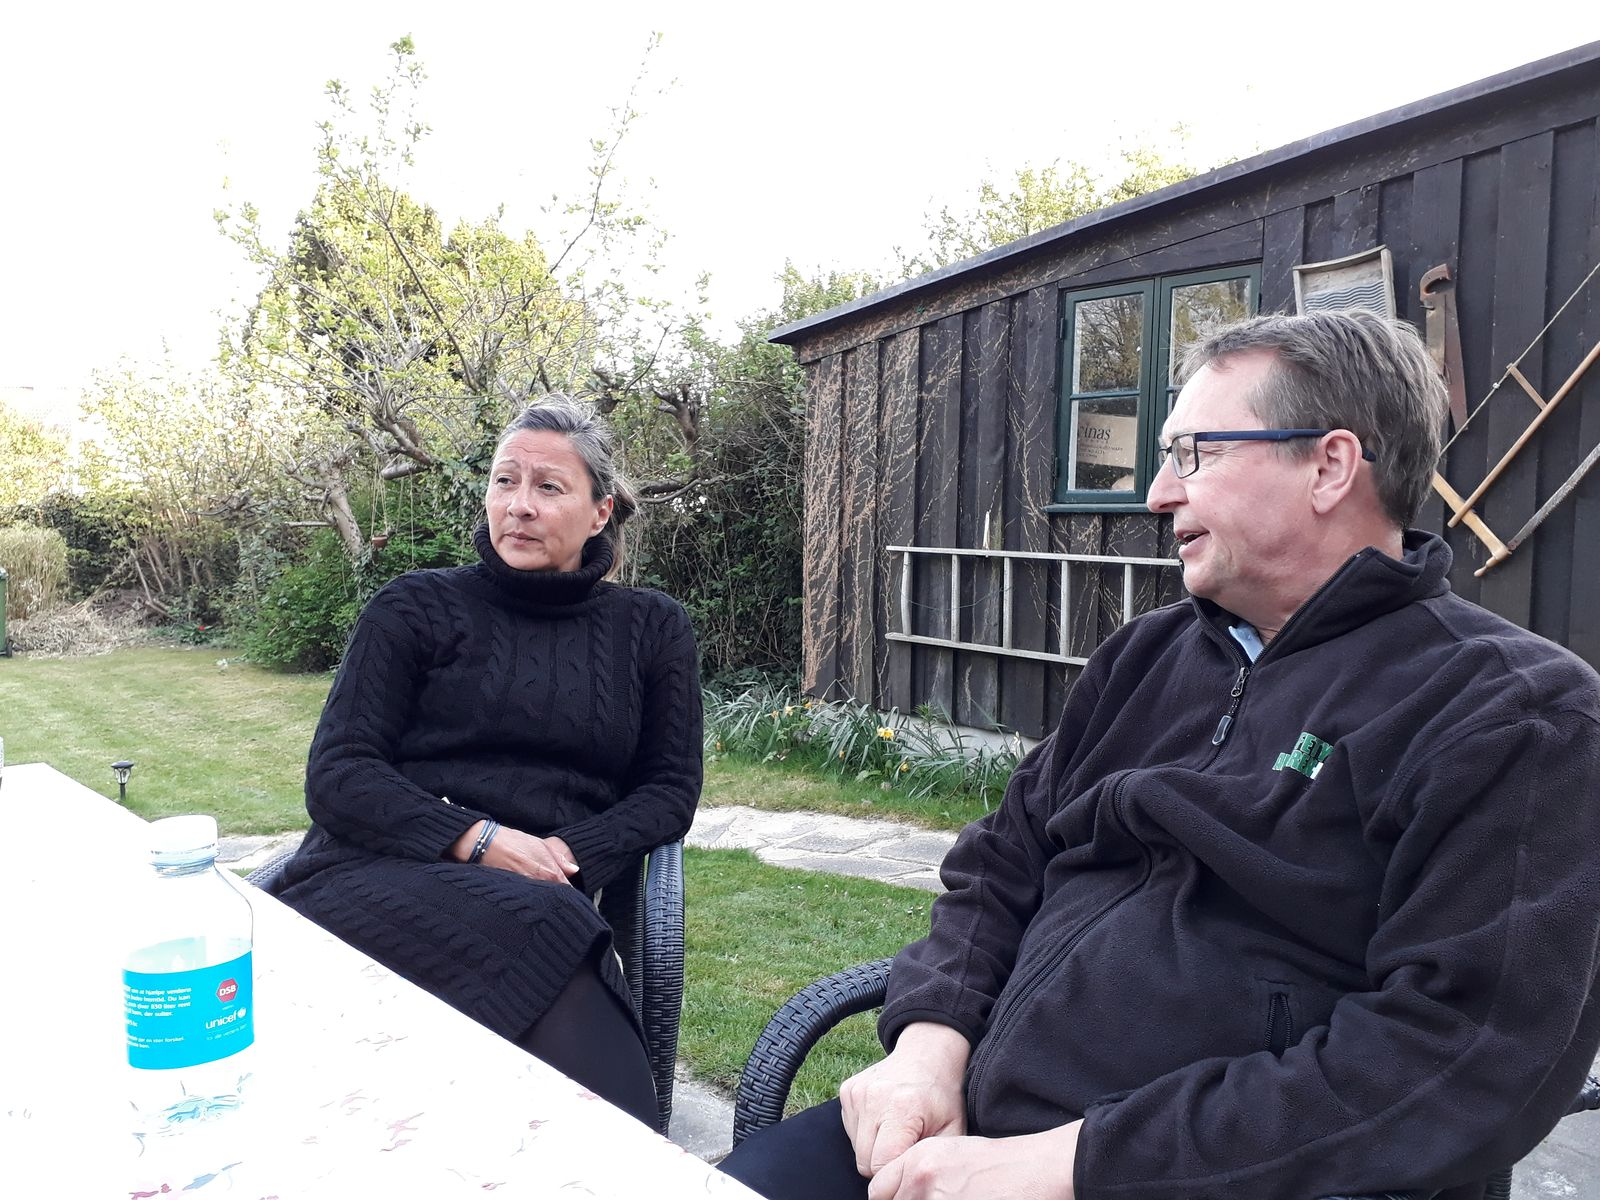 2019-04-30-1858_-_Johanne-Grønvold-Peter-Thrane